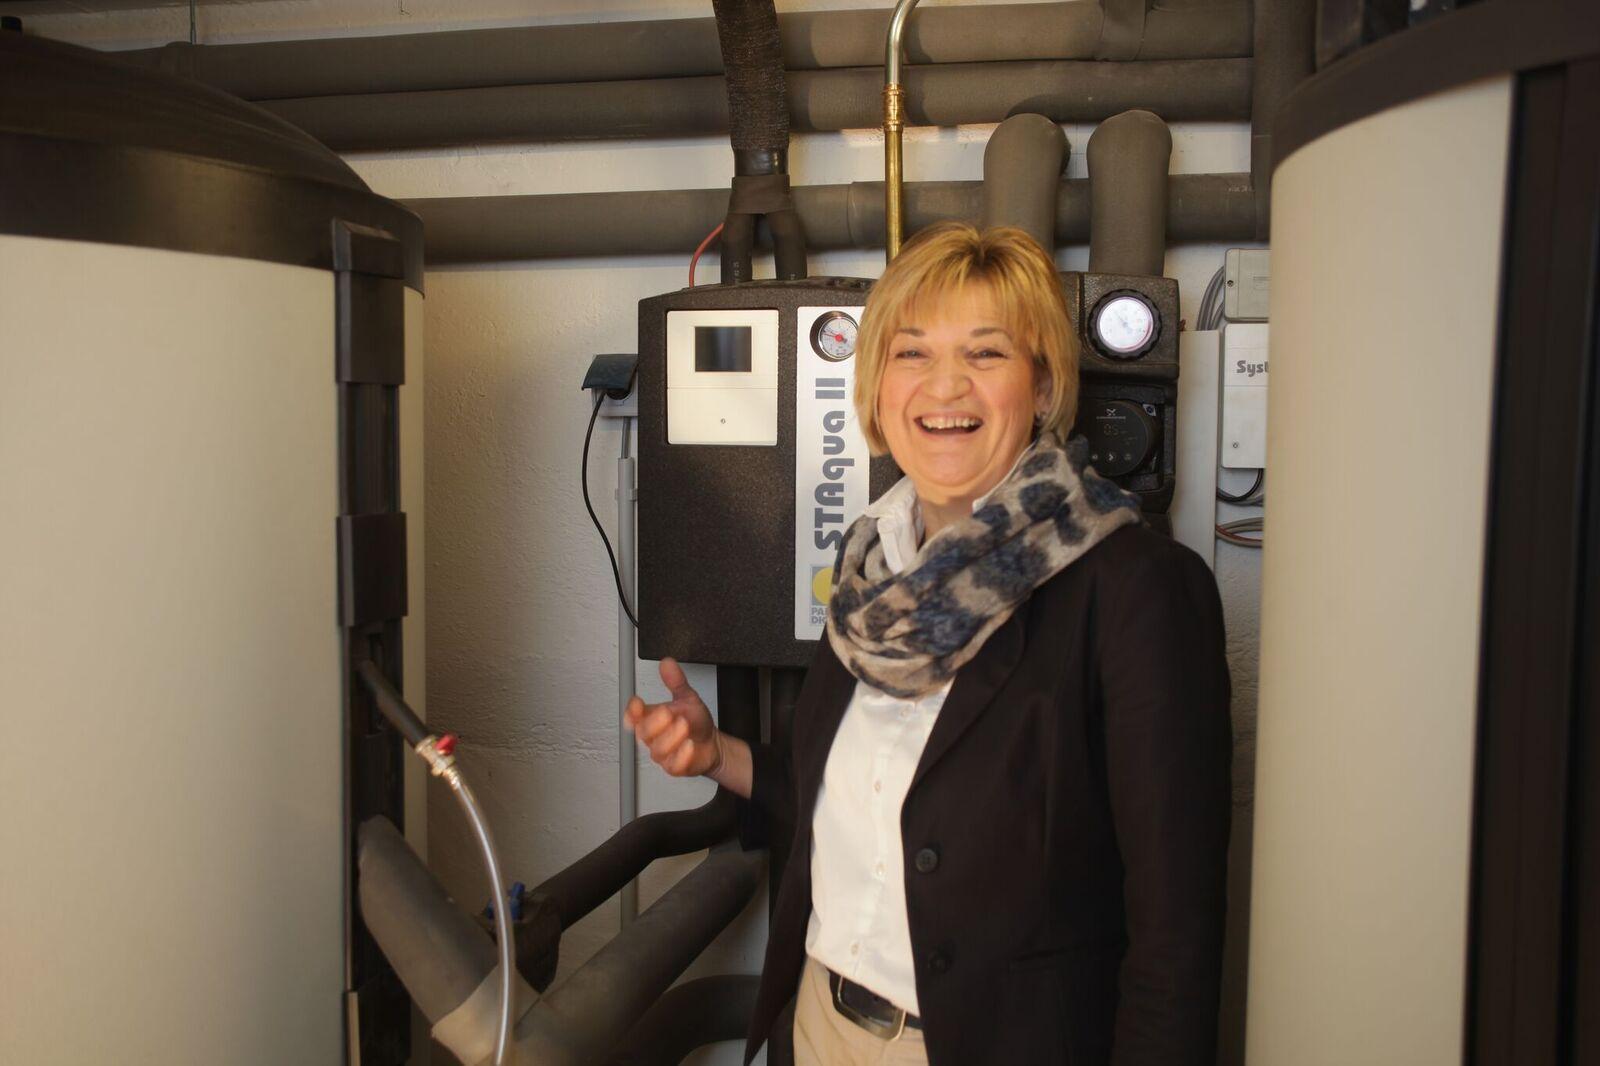 Projekt des Monats 2 November 2017 Hofer Haustechnik GmbH Mehrfamilienhaus